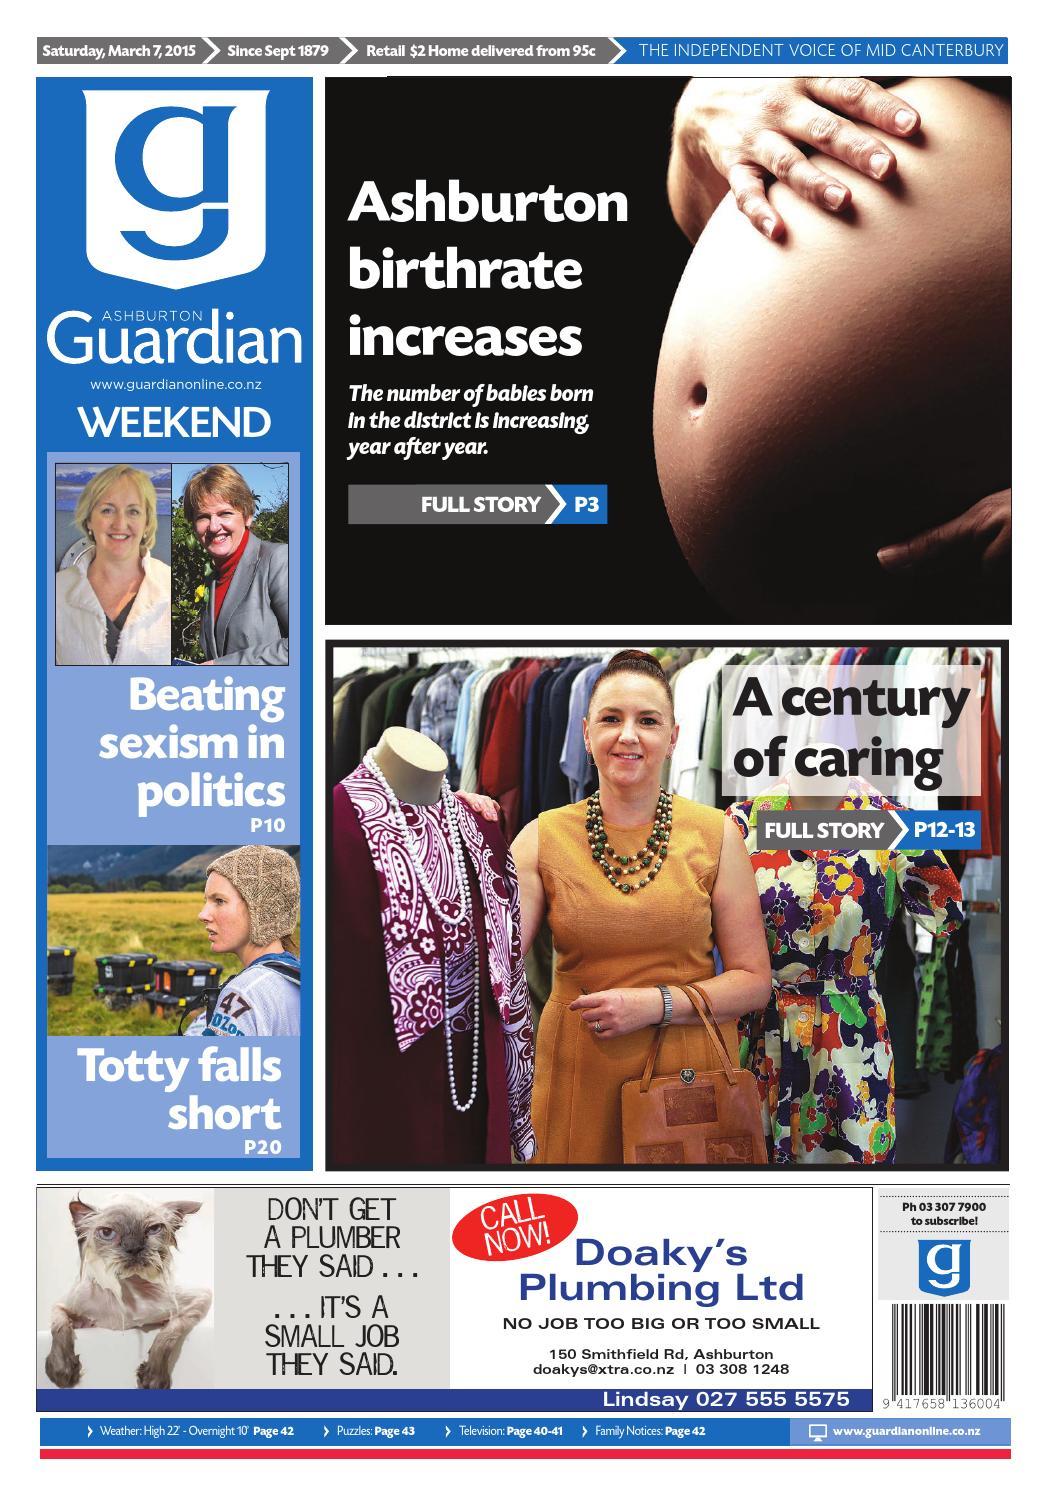 Reg: credibility of Letham Shank Farm UK?